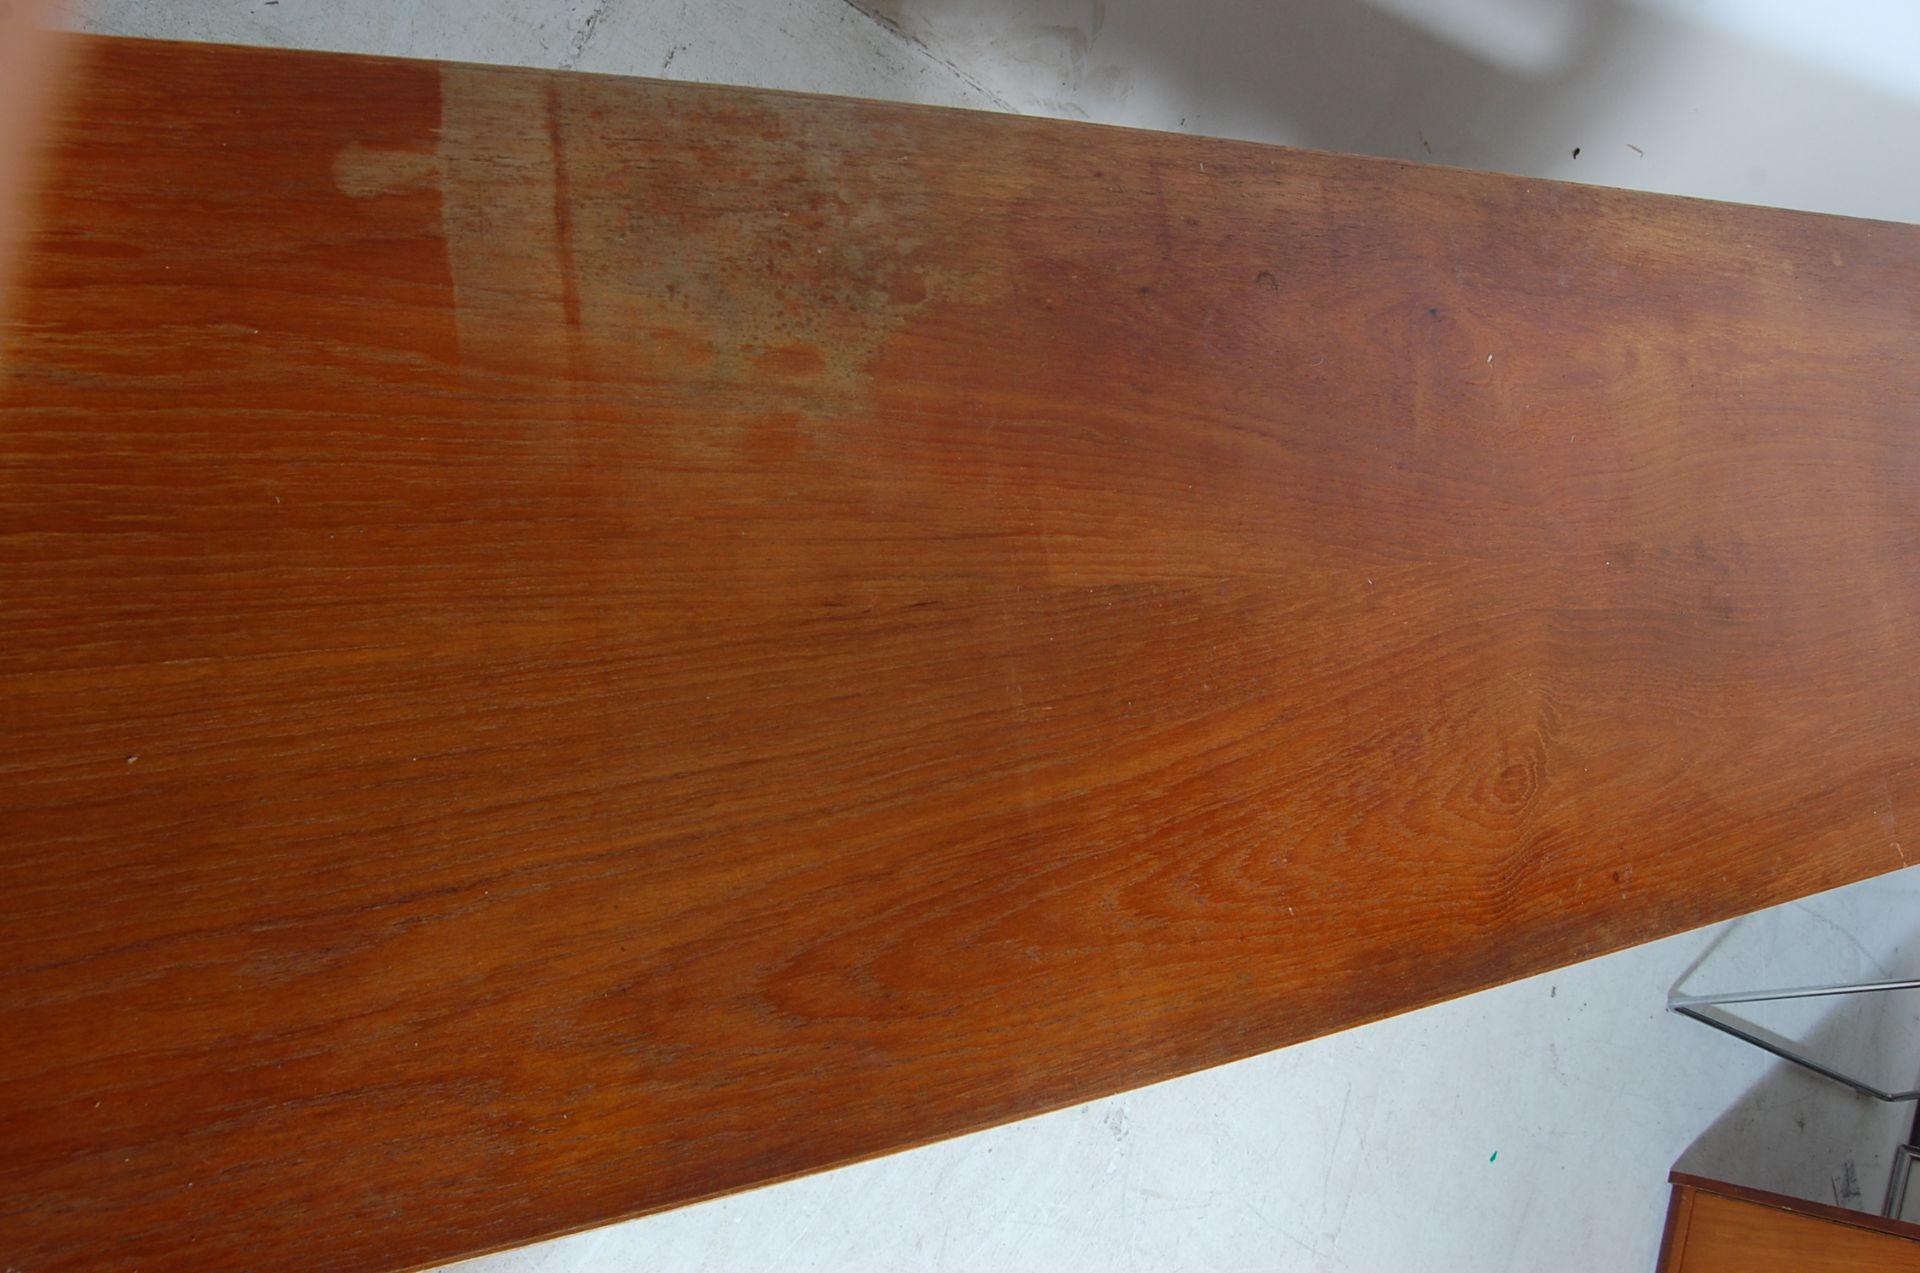 MID CENTURY TEAK WOOD STEREO HI-FI CABINET SIDEBOARD - Image 3 of 6